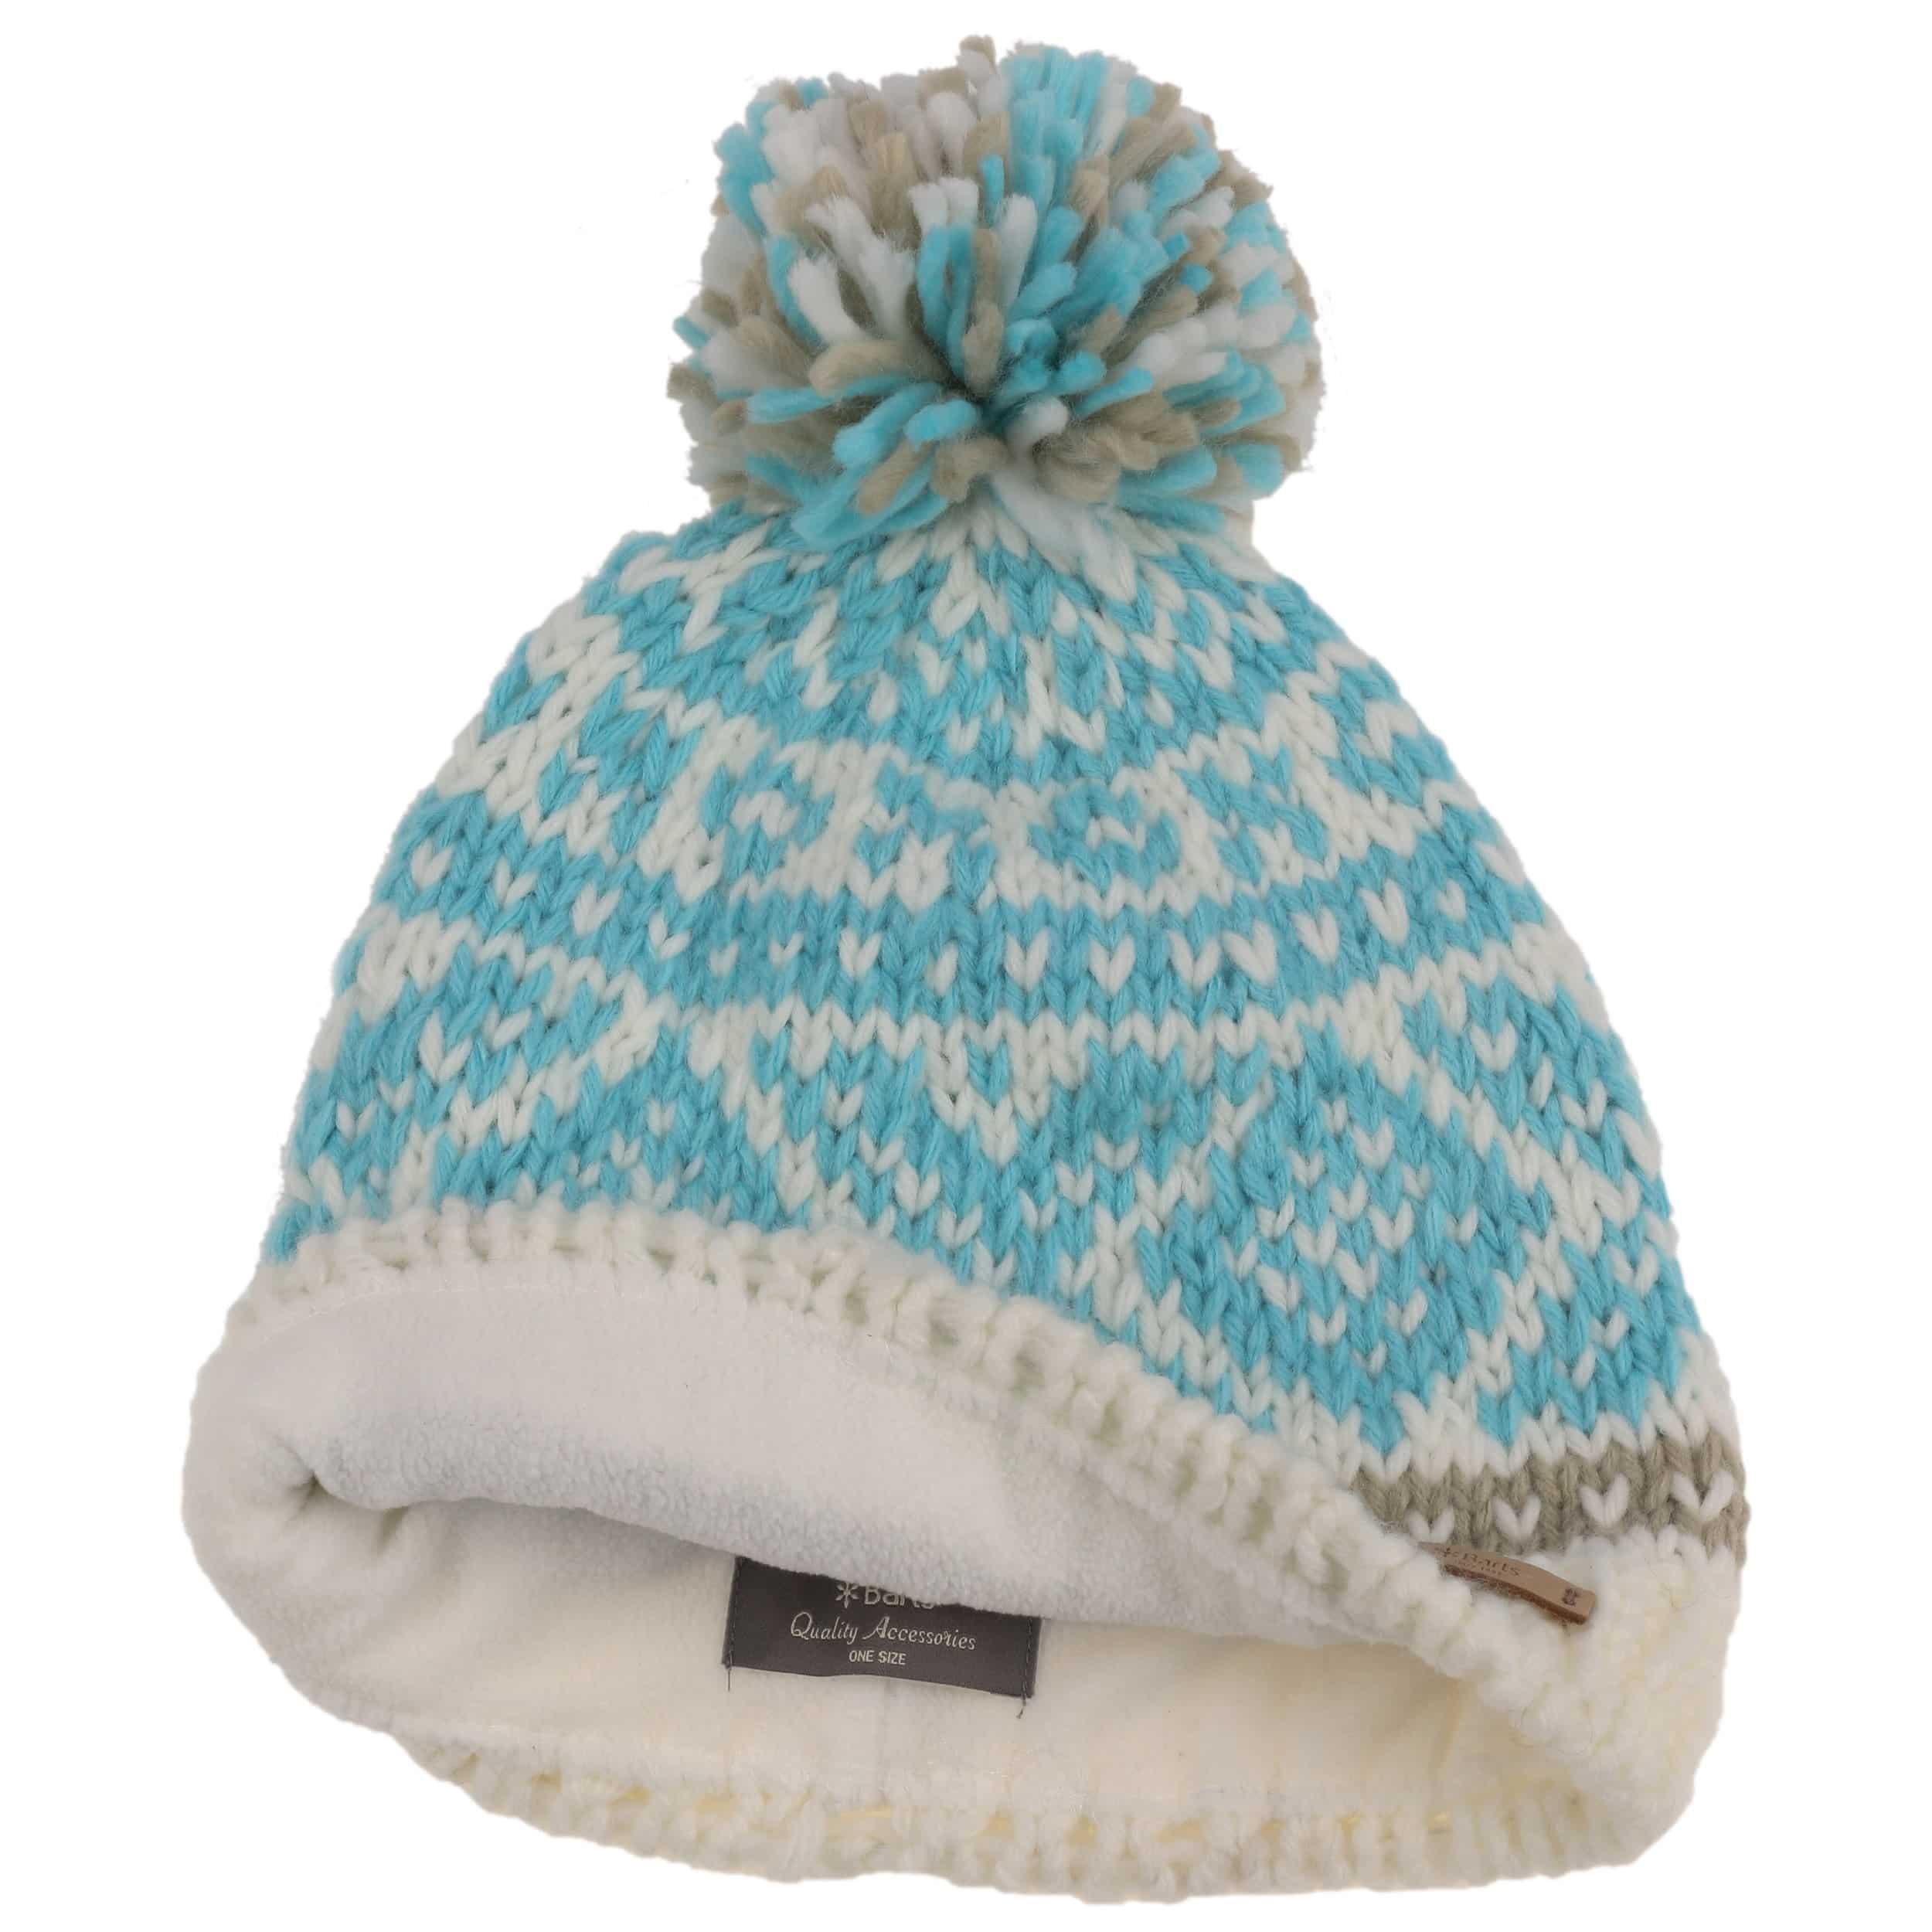 38ed5a5d9e8 ... Log Cabin Pompom Hat by Barts - cream white 1 ...